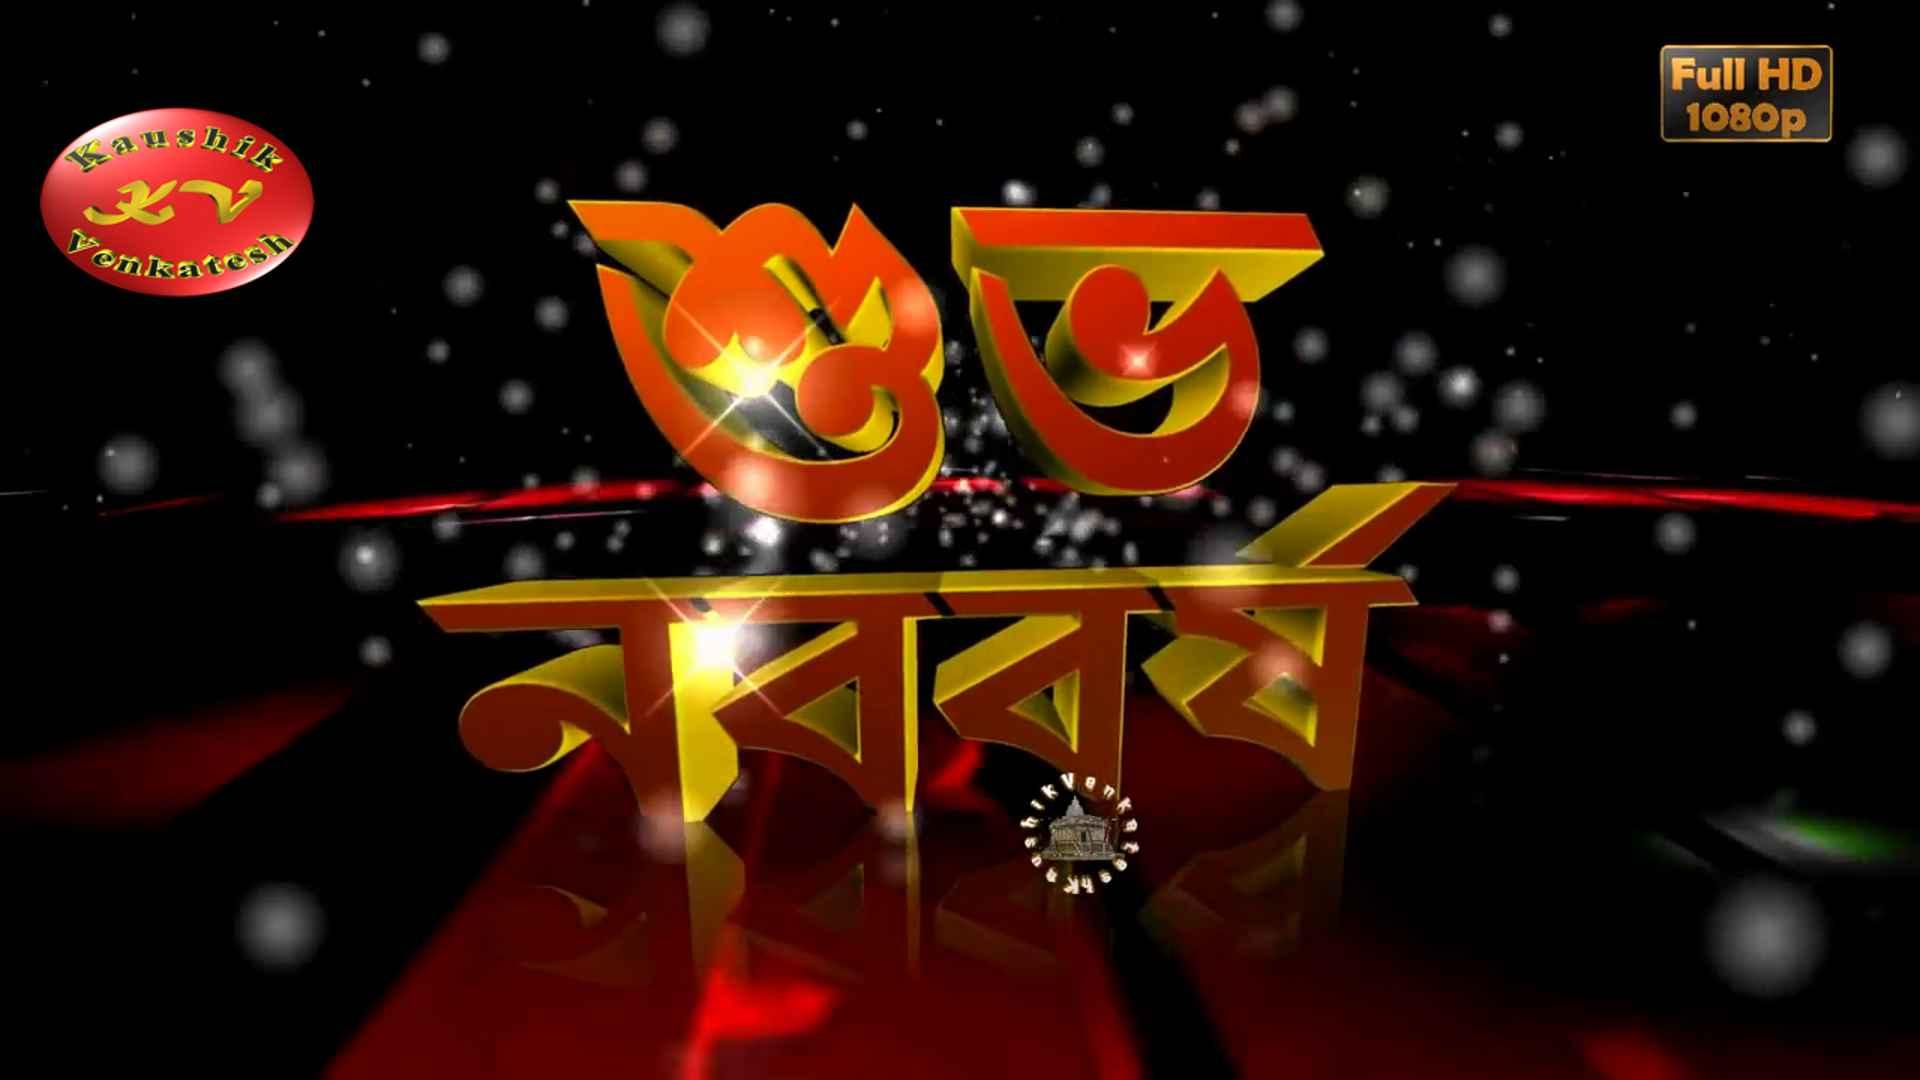 Poila Baisakh Images in Bengali